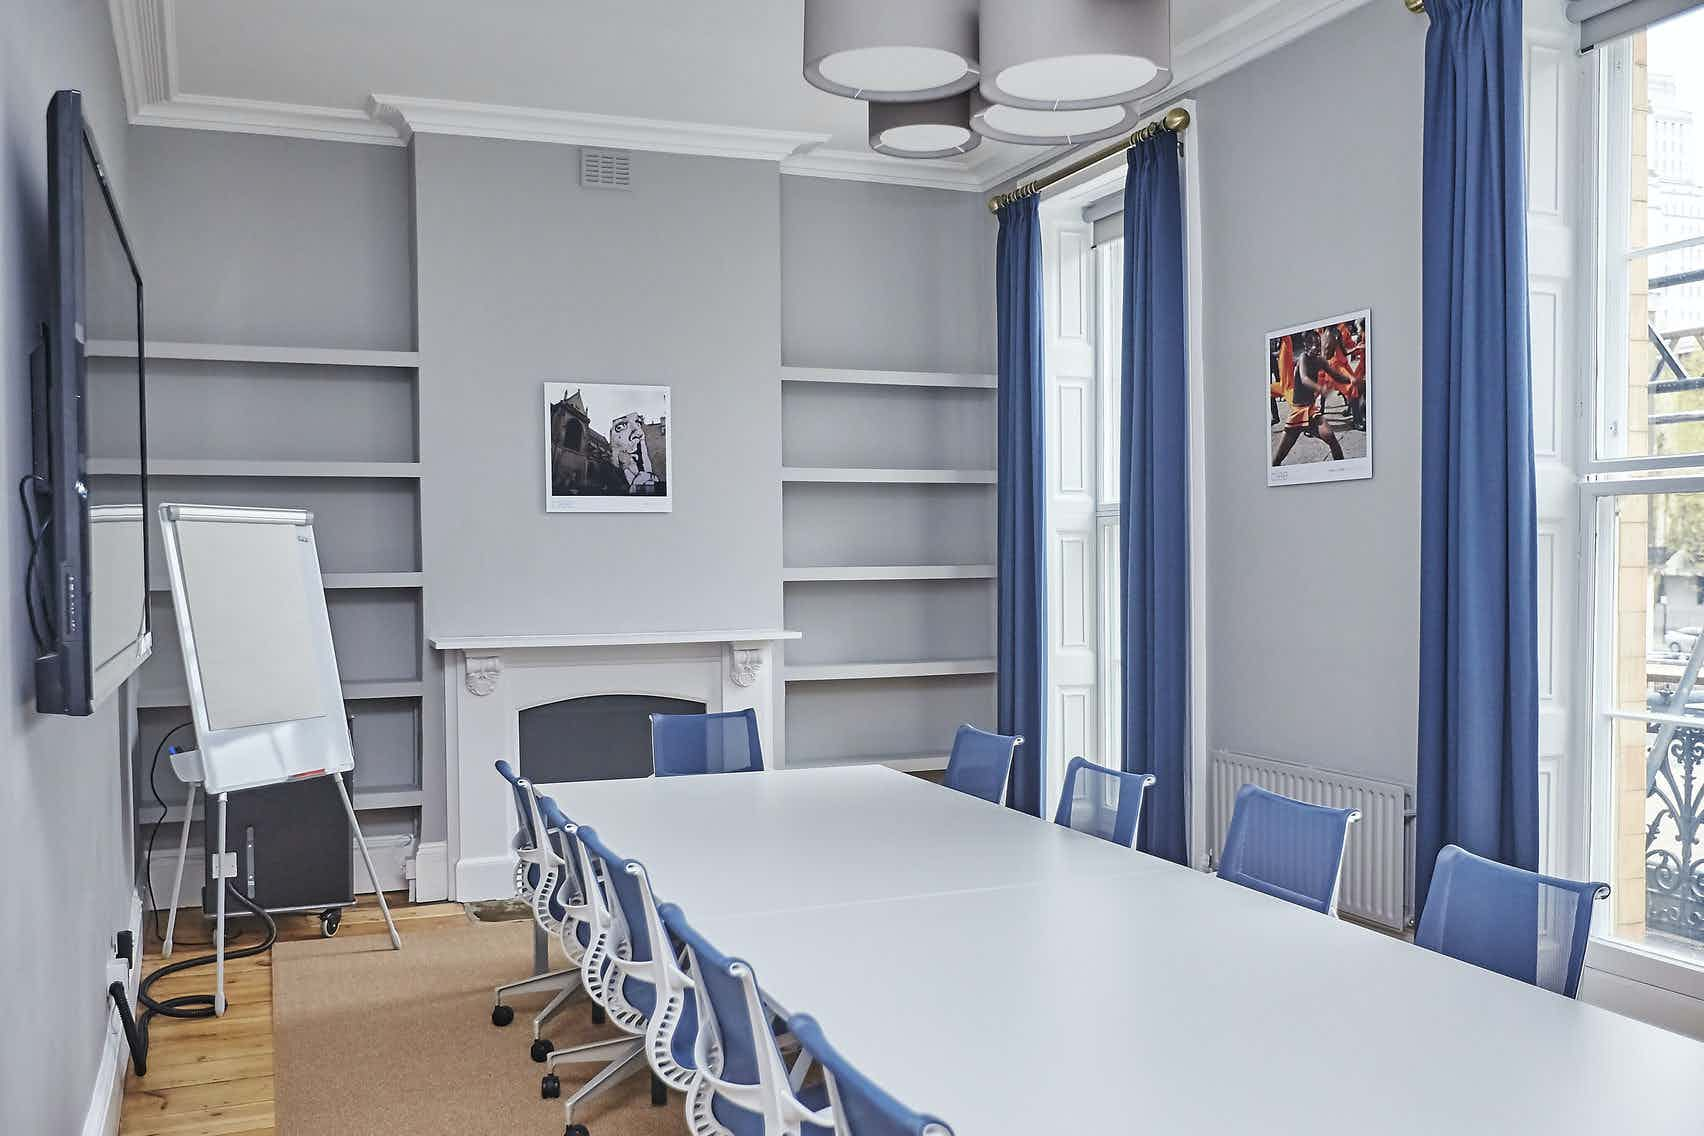 Kensington meeting room, CIEE, Russell Square